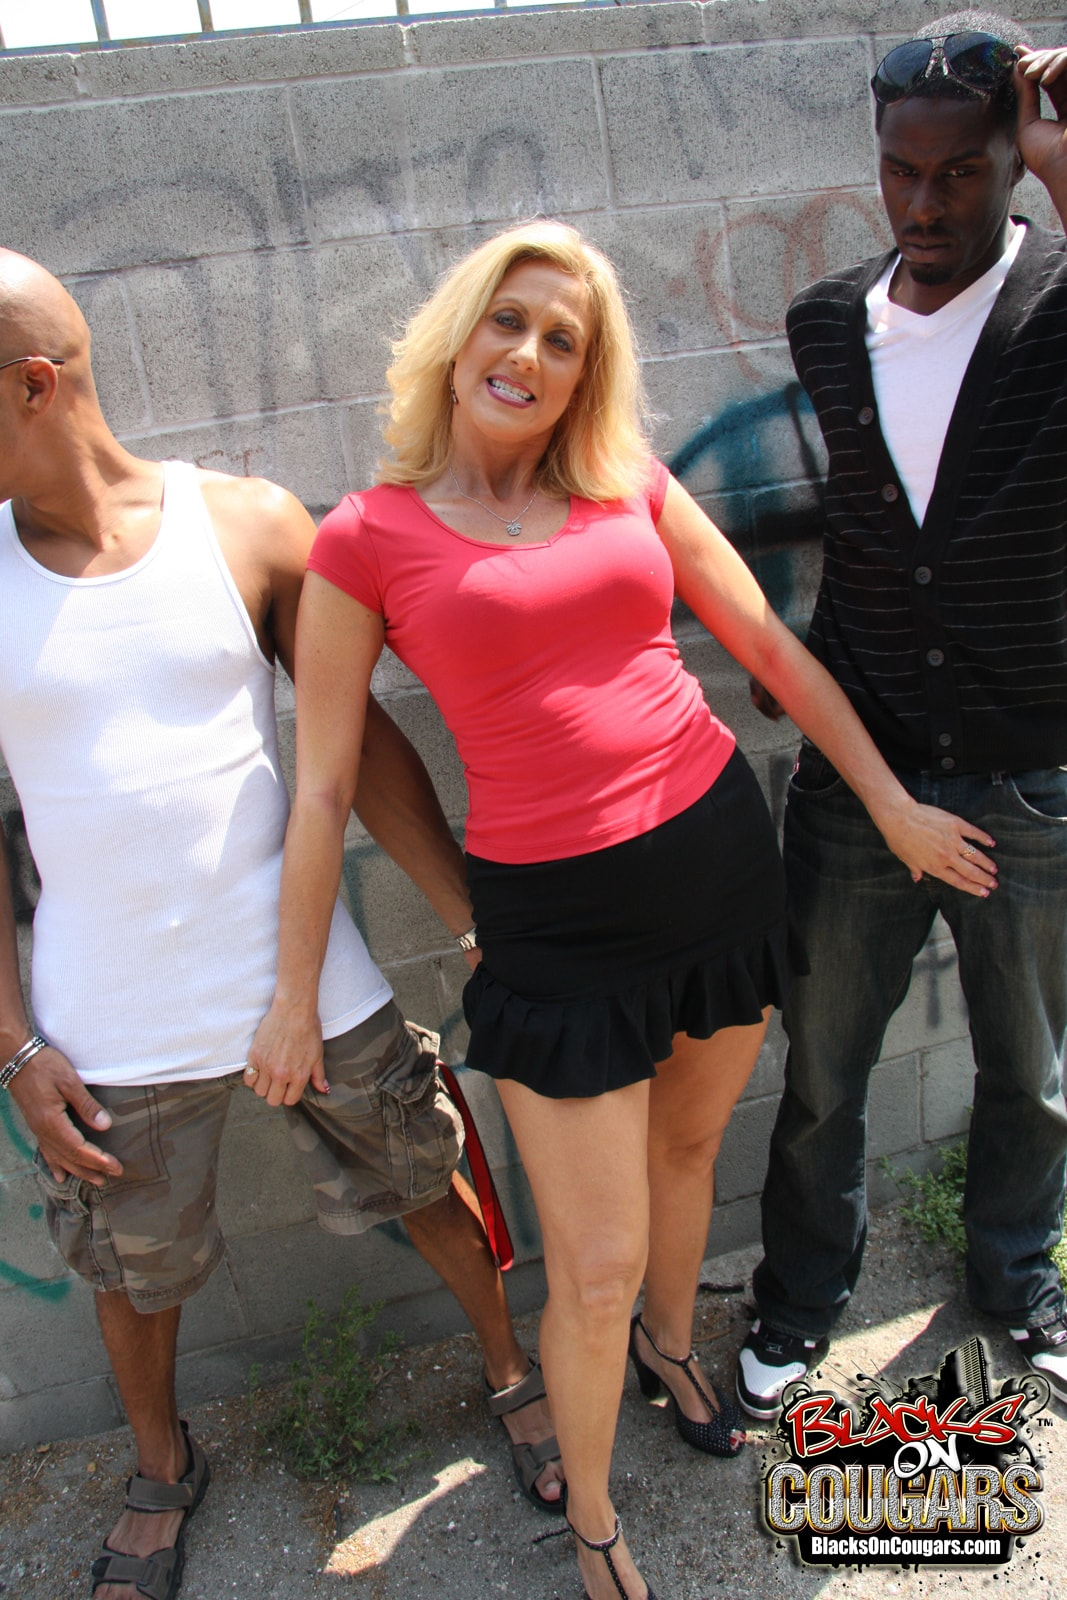 Dogfart '- Blacks On Cougars' starring Dana Devine (Photo 3)